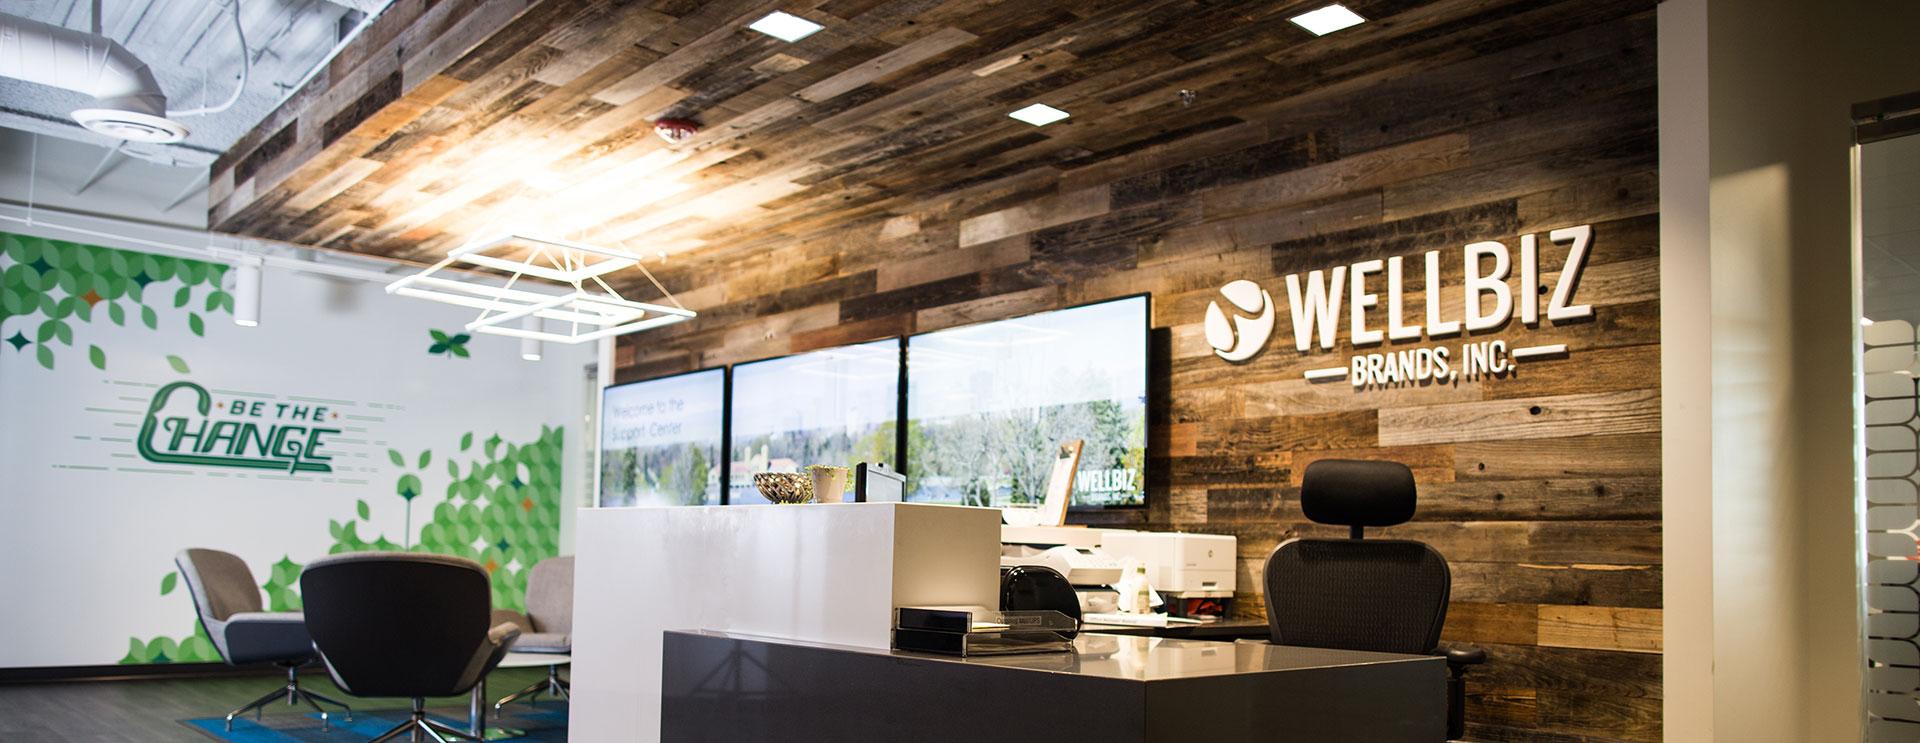 WellBiz Brands, Inc. Awards Two Large Multi-Unit Agreements